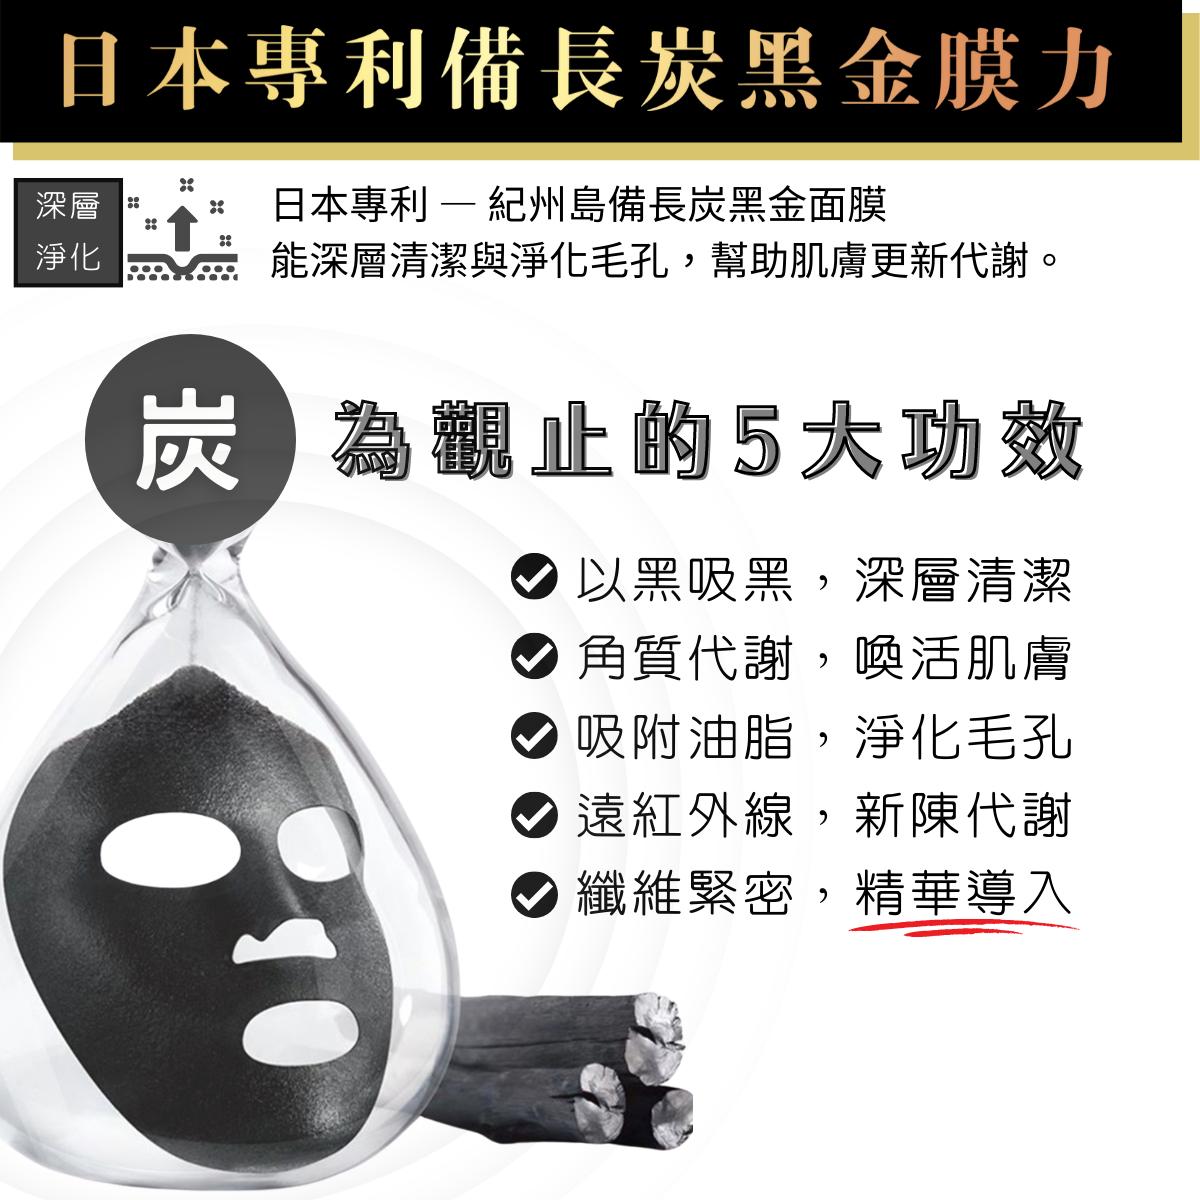 Doux 妒 備長炭金箔活膚面膜 -  採用100%日本專利備長炭面膜 掃除肌膚瑕疵